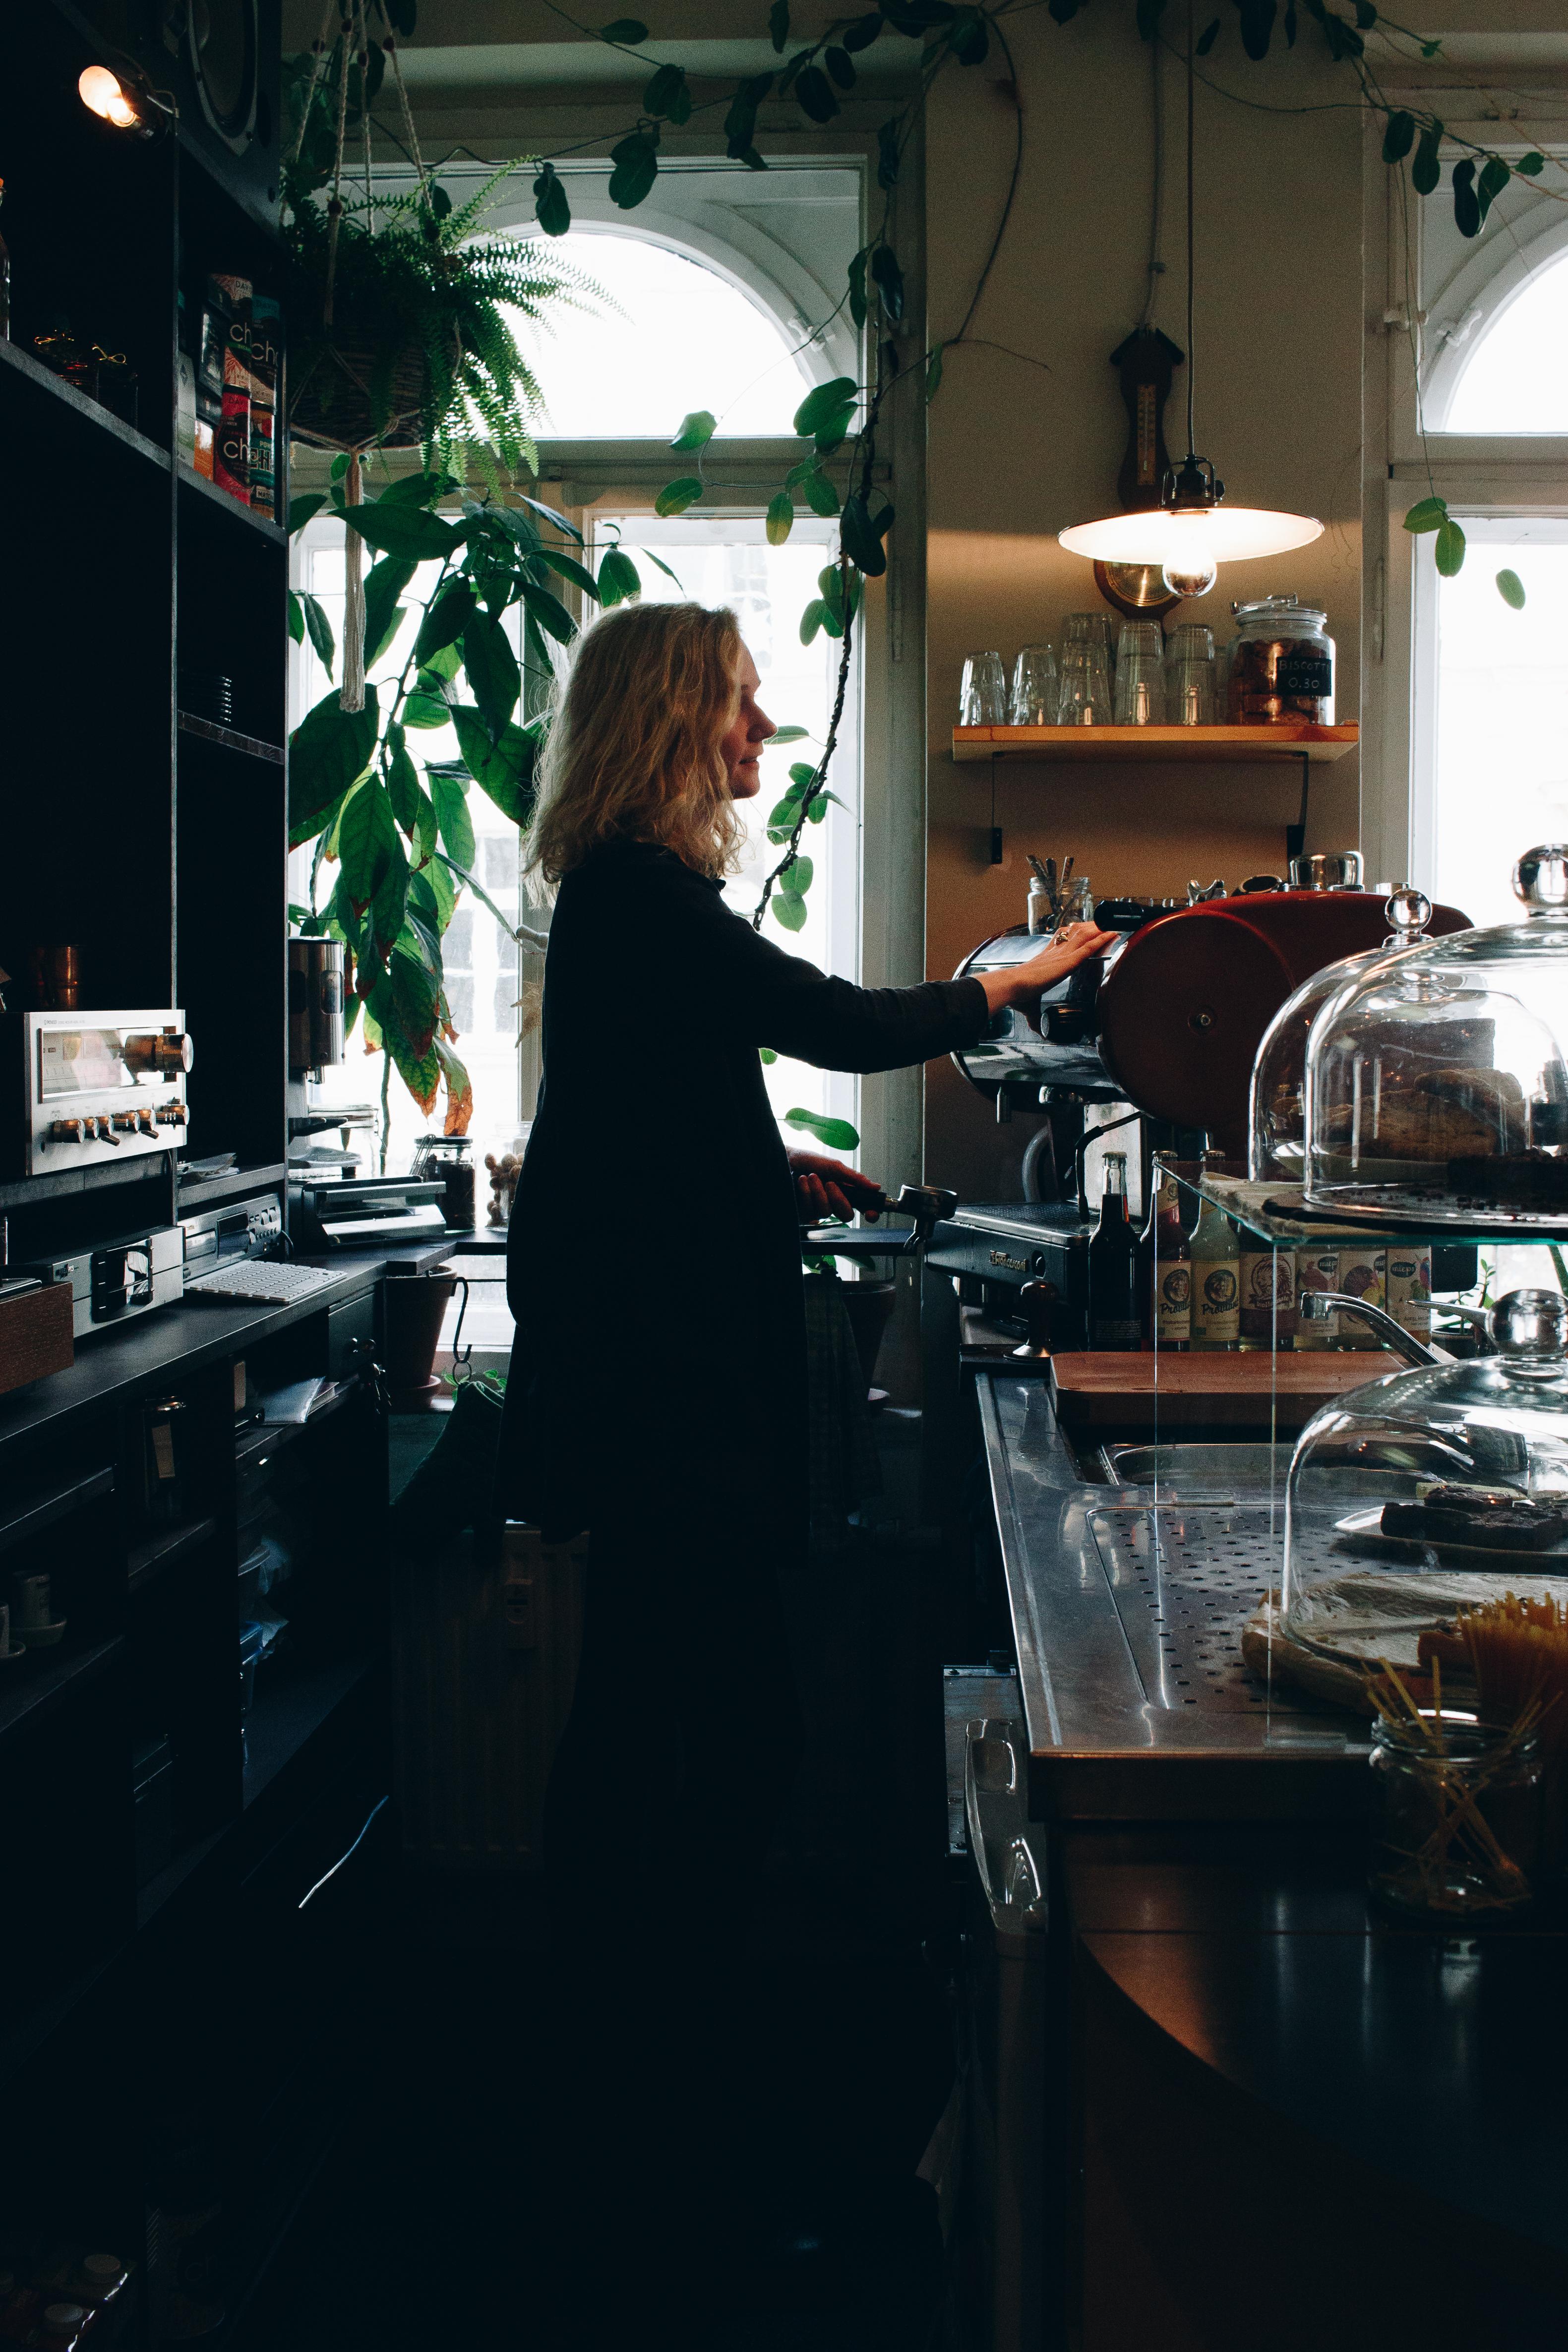 s1 vinyl&kaffee-leutzsch-leipzig-annabelle sagt18